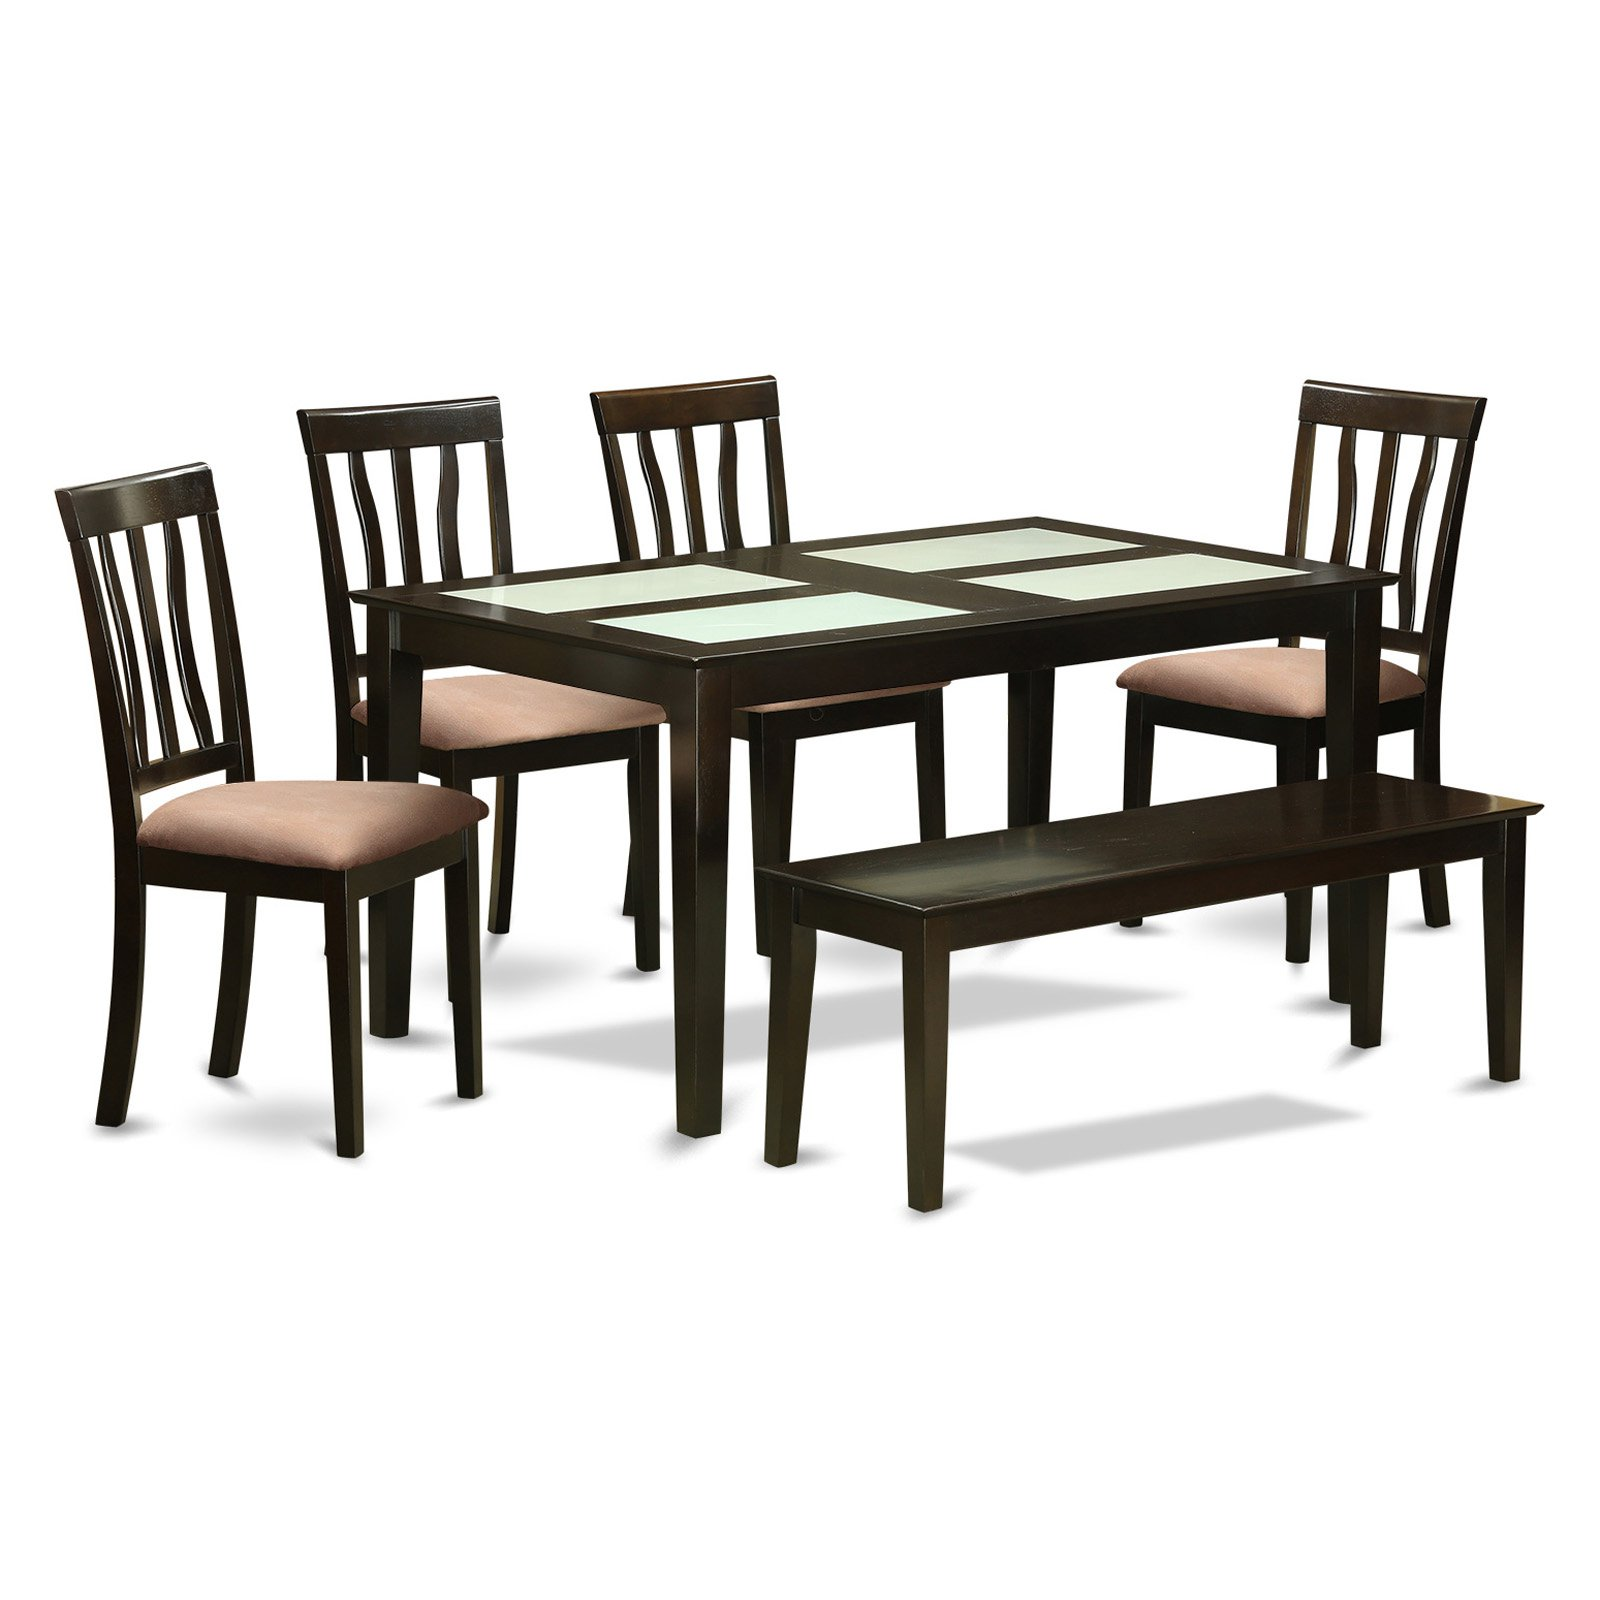 East West Furniture Capri 6 Piece Splat Back Glass Top Dining Table Set